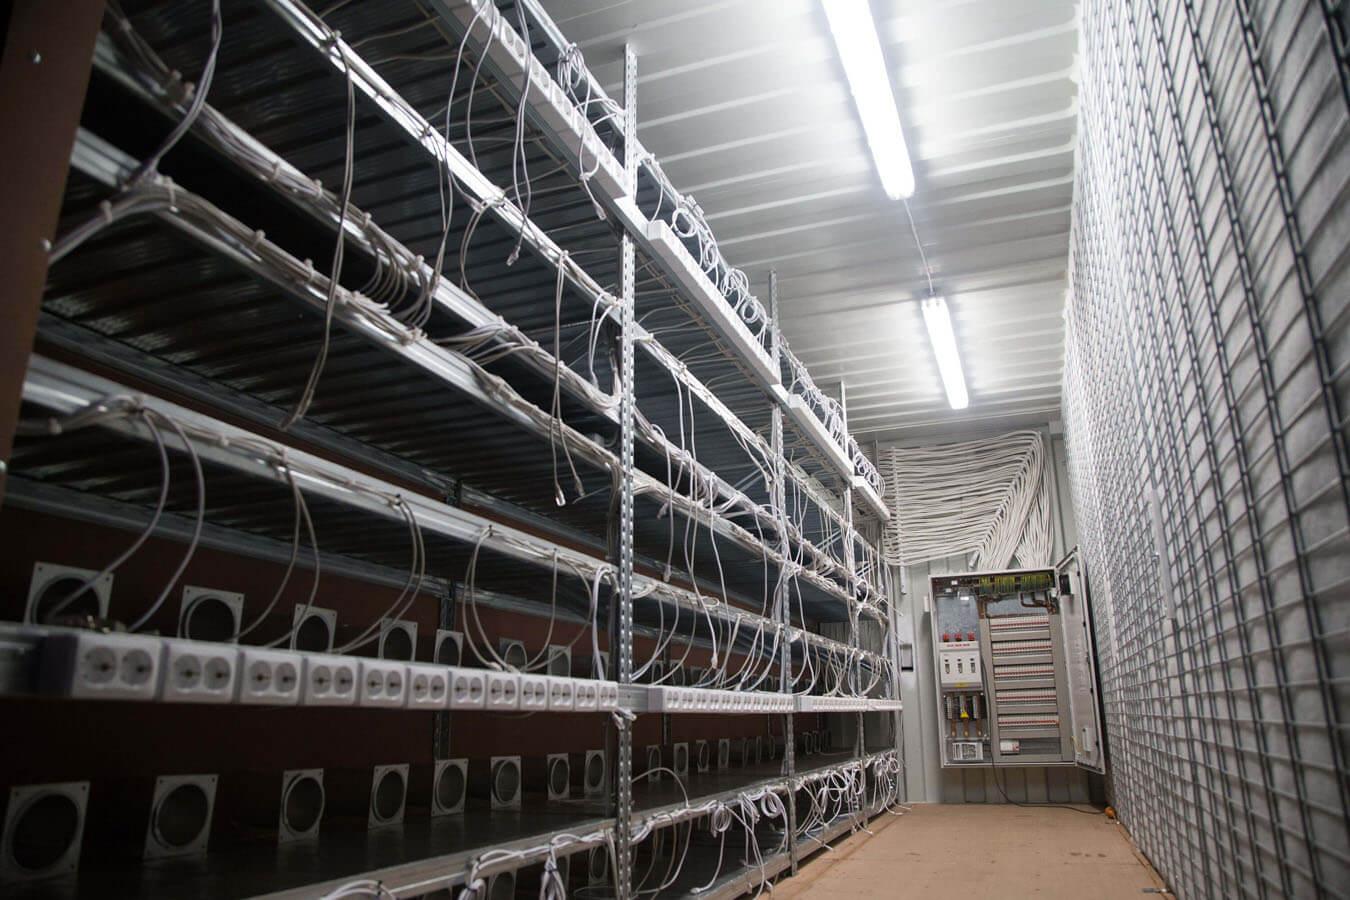 Ťažba Kryptomien - Kontajner - Farma - Datacentrum